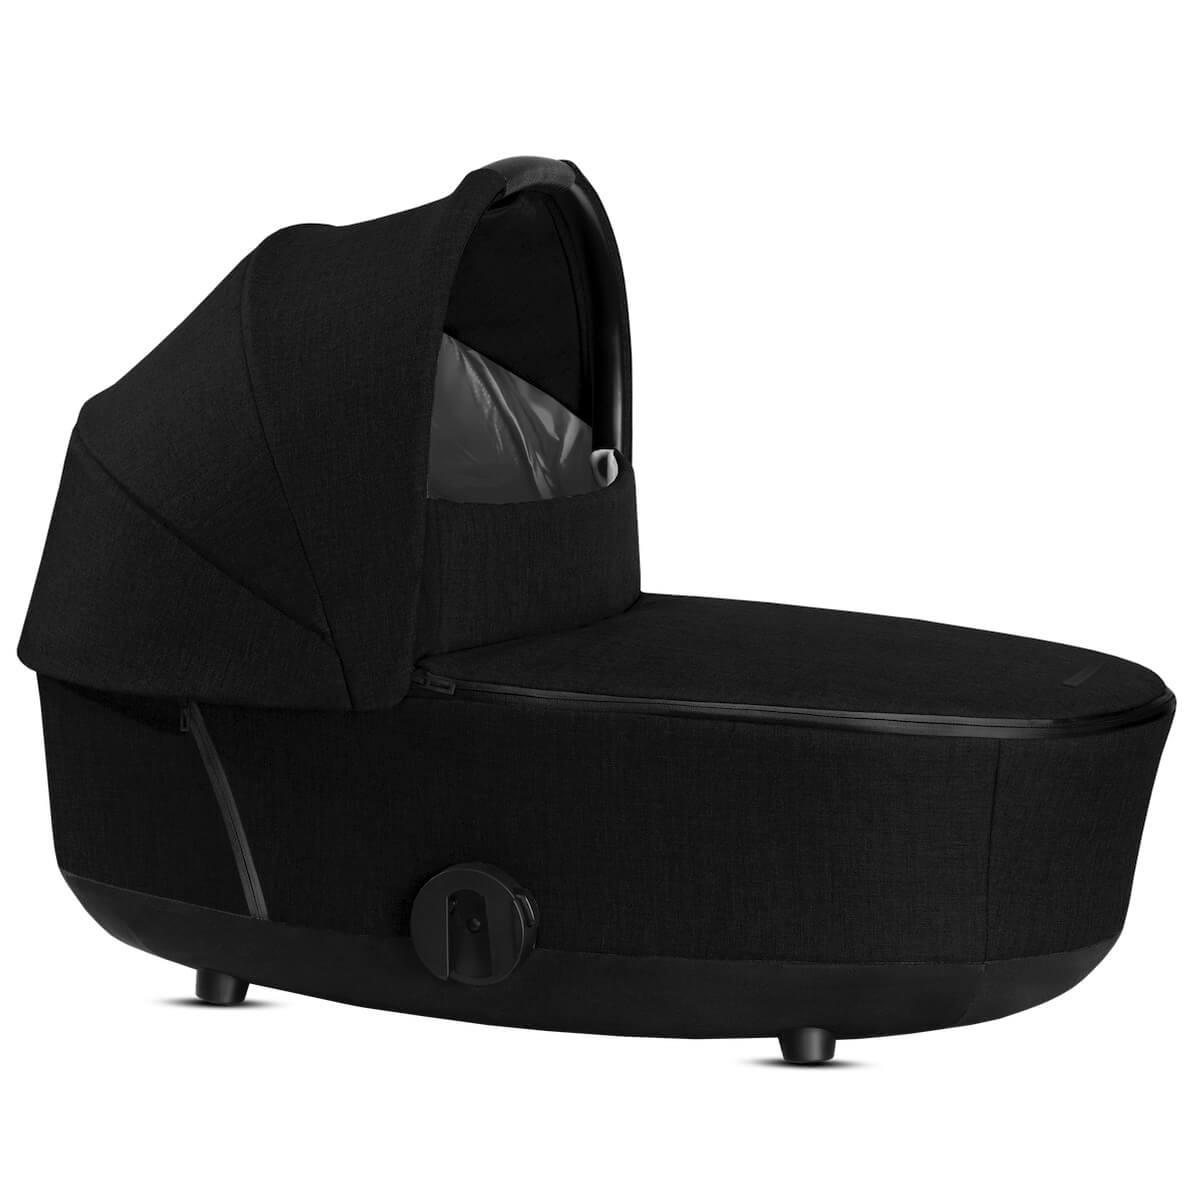 Capazo de luxe MIOS Cybex Plus Stardust Black Plus-black